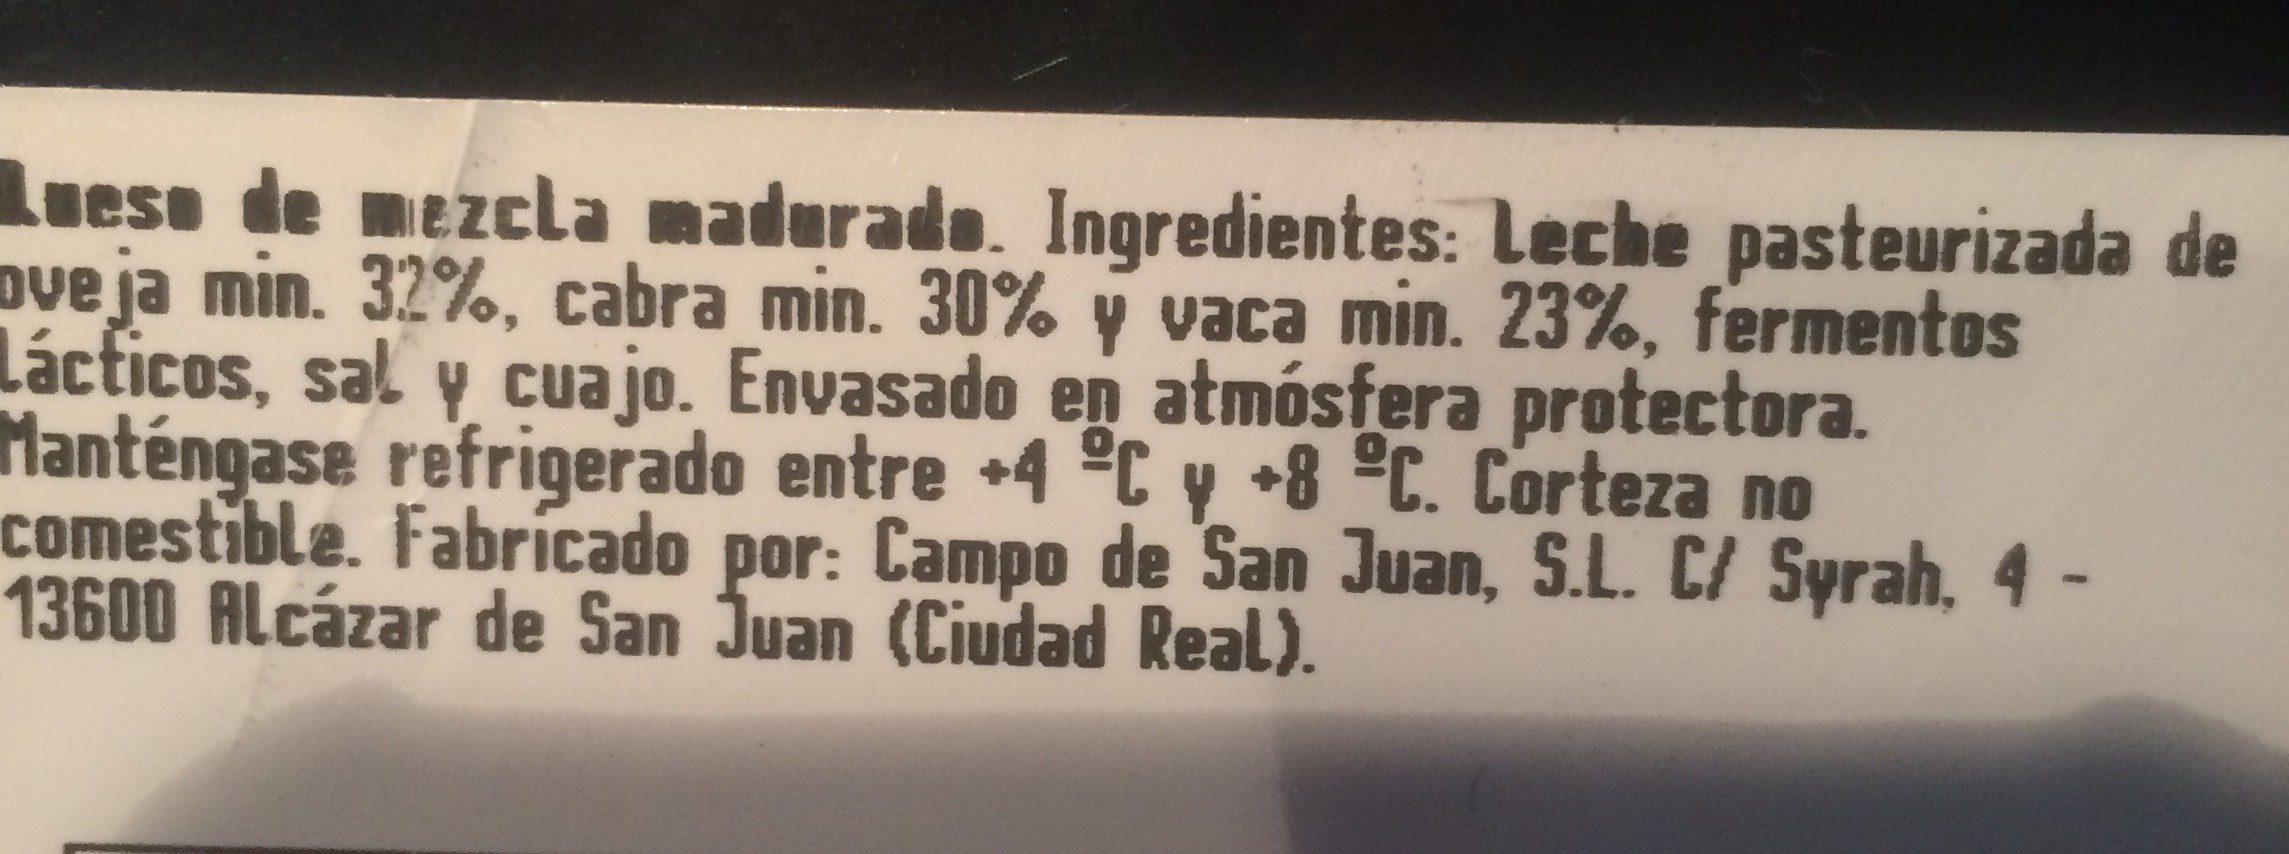 GRAN RESERVA - Ingredients